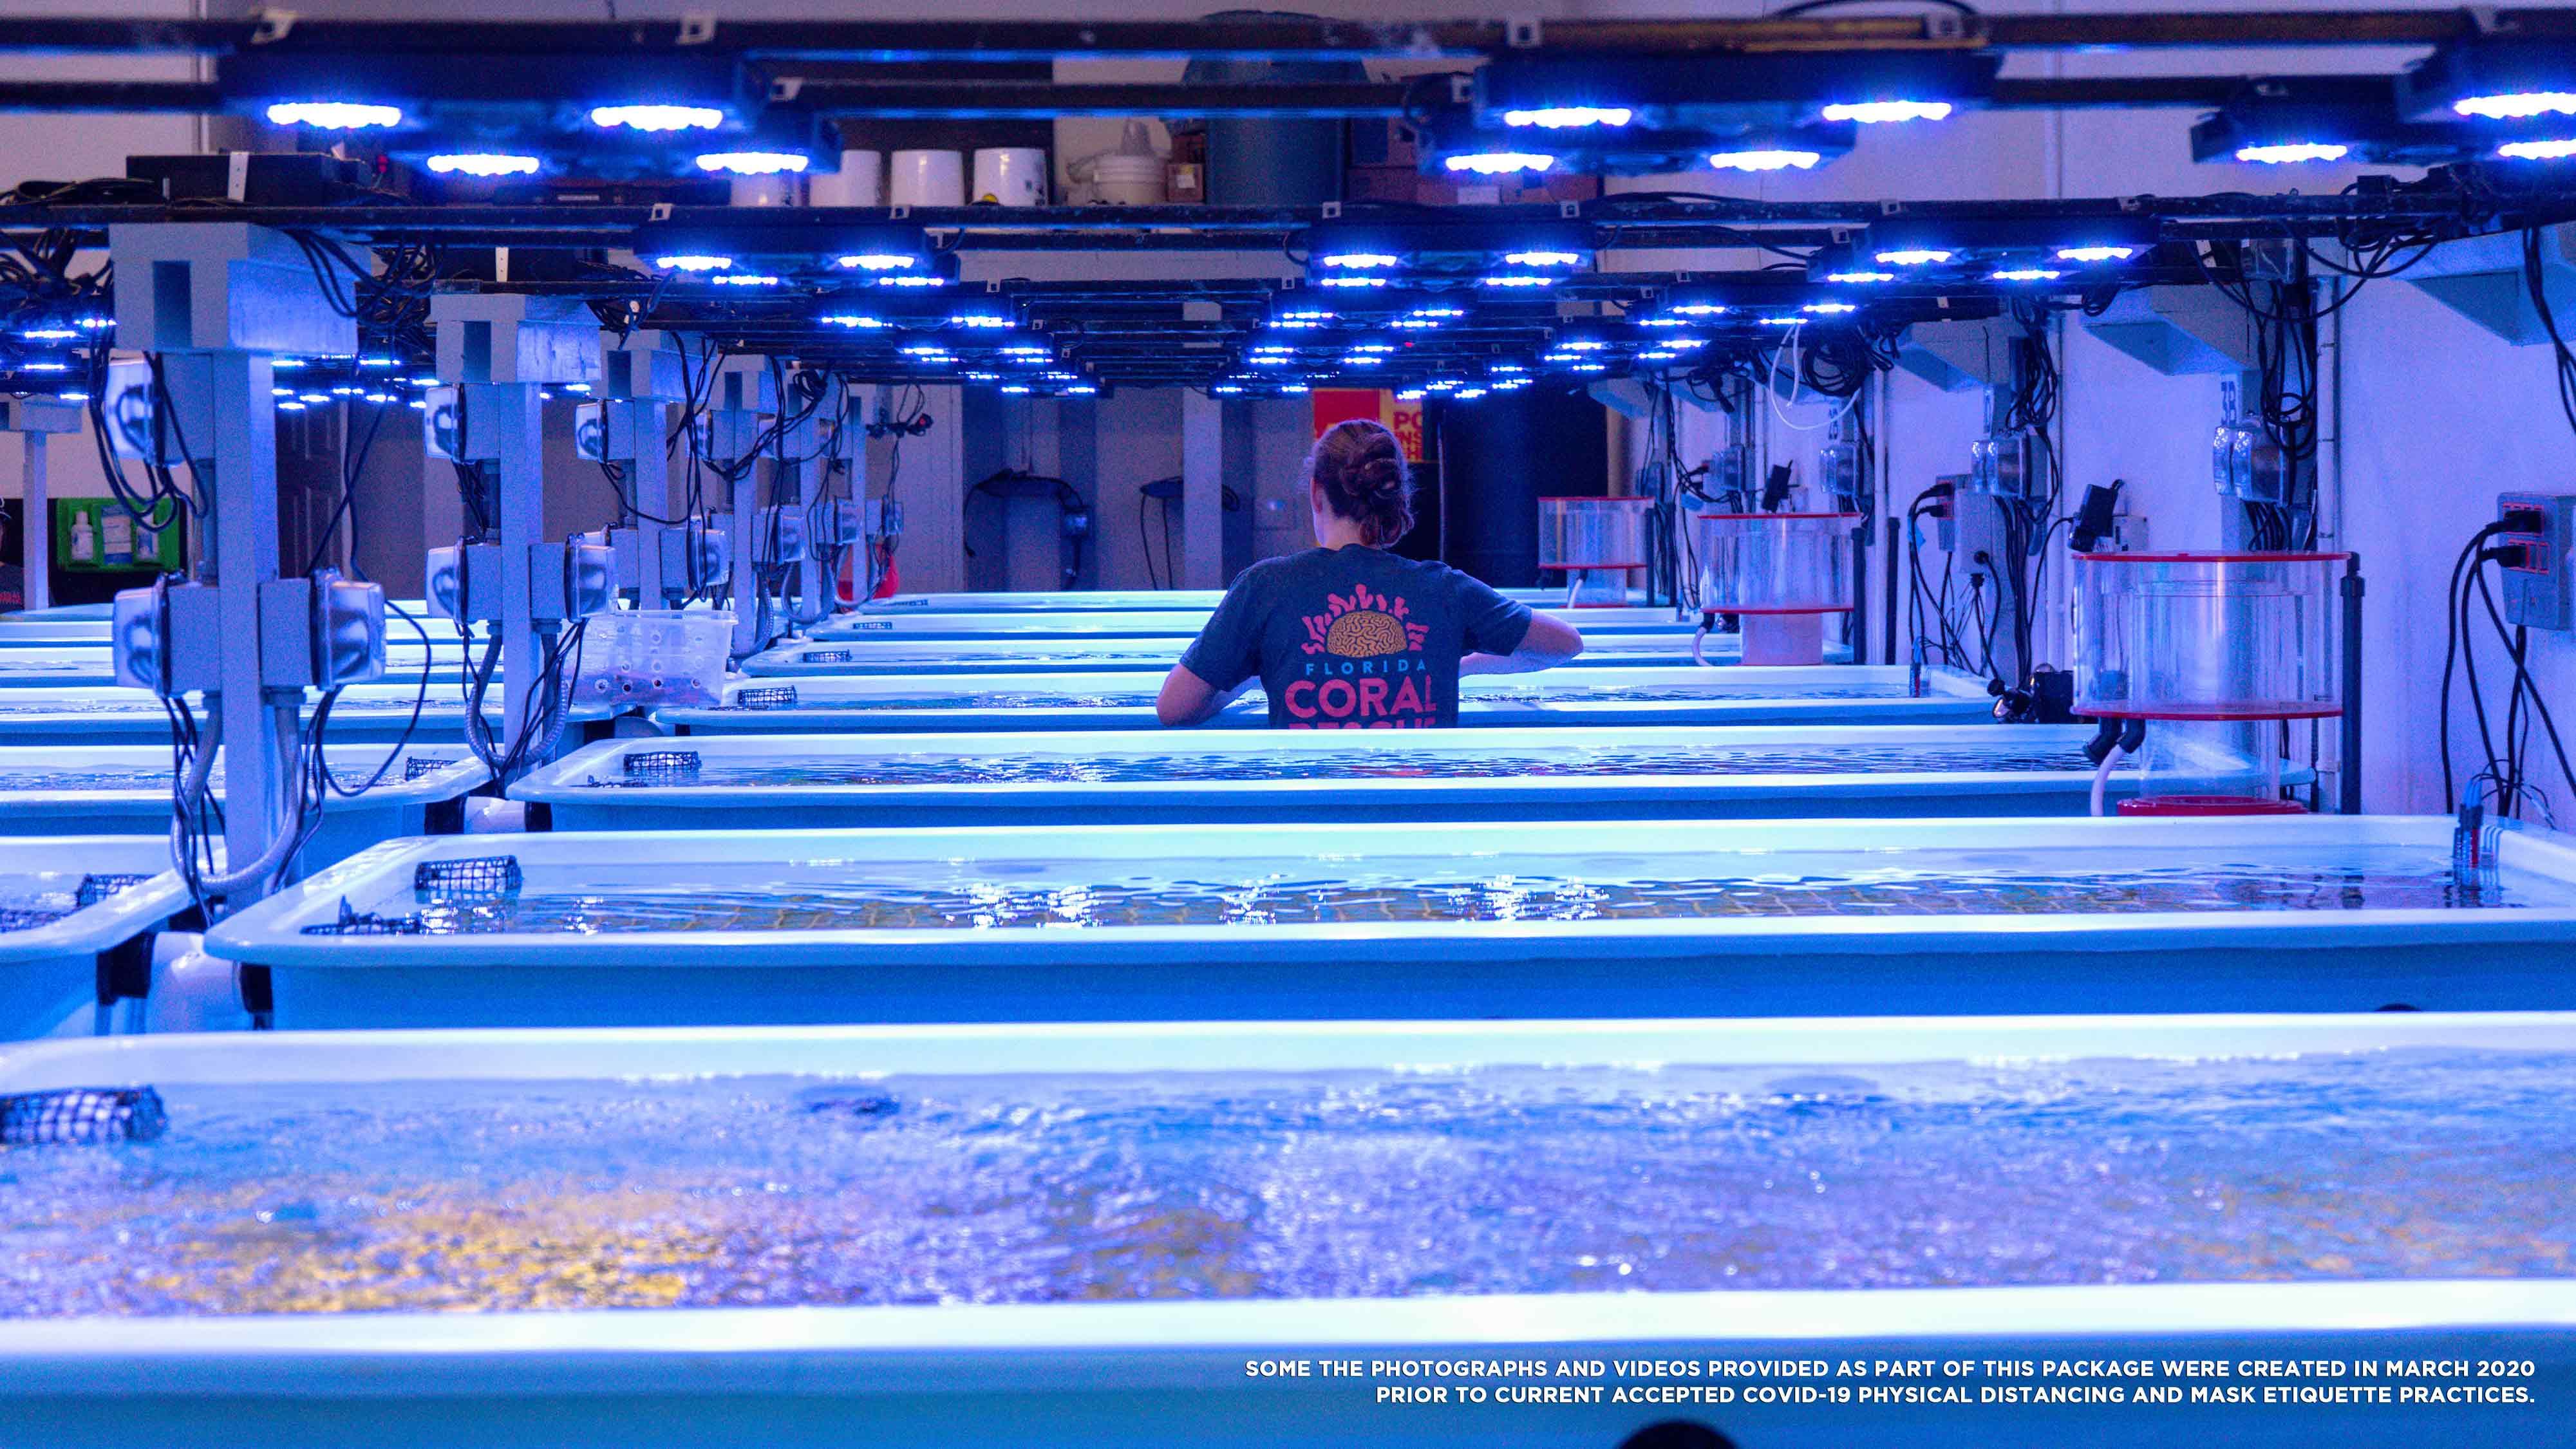 Inside the Florida Coral Rescue Center